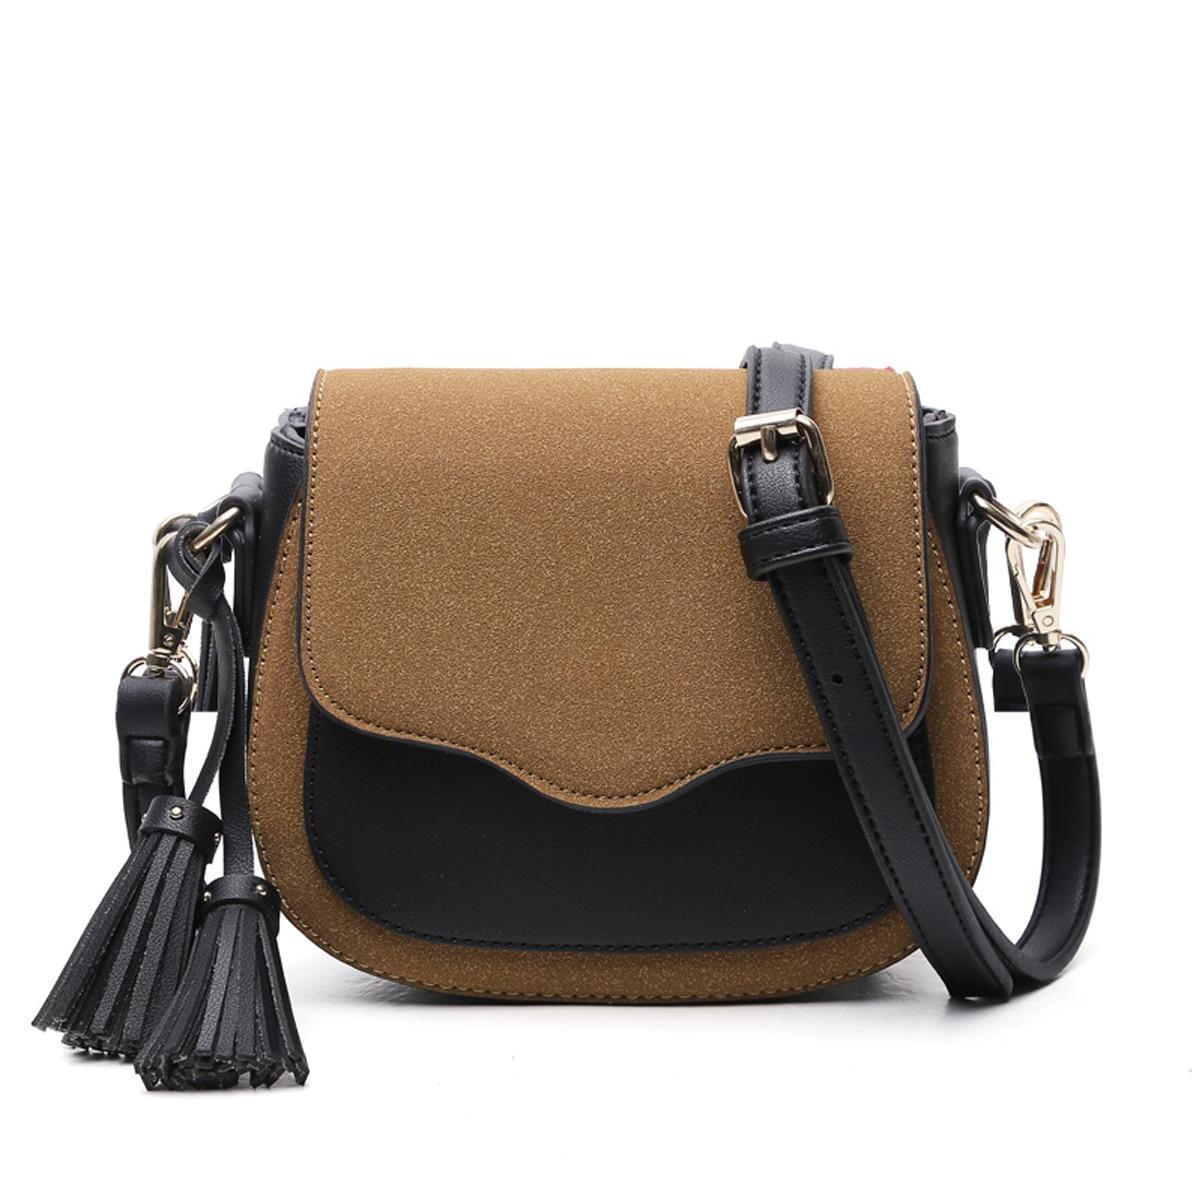 DIY сумки сумка кожа набор трафаретов шаблон акрил трафарет Leathercraft Наборы инструментов для DIY ретро сумка дизайн